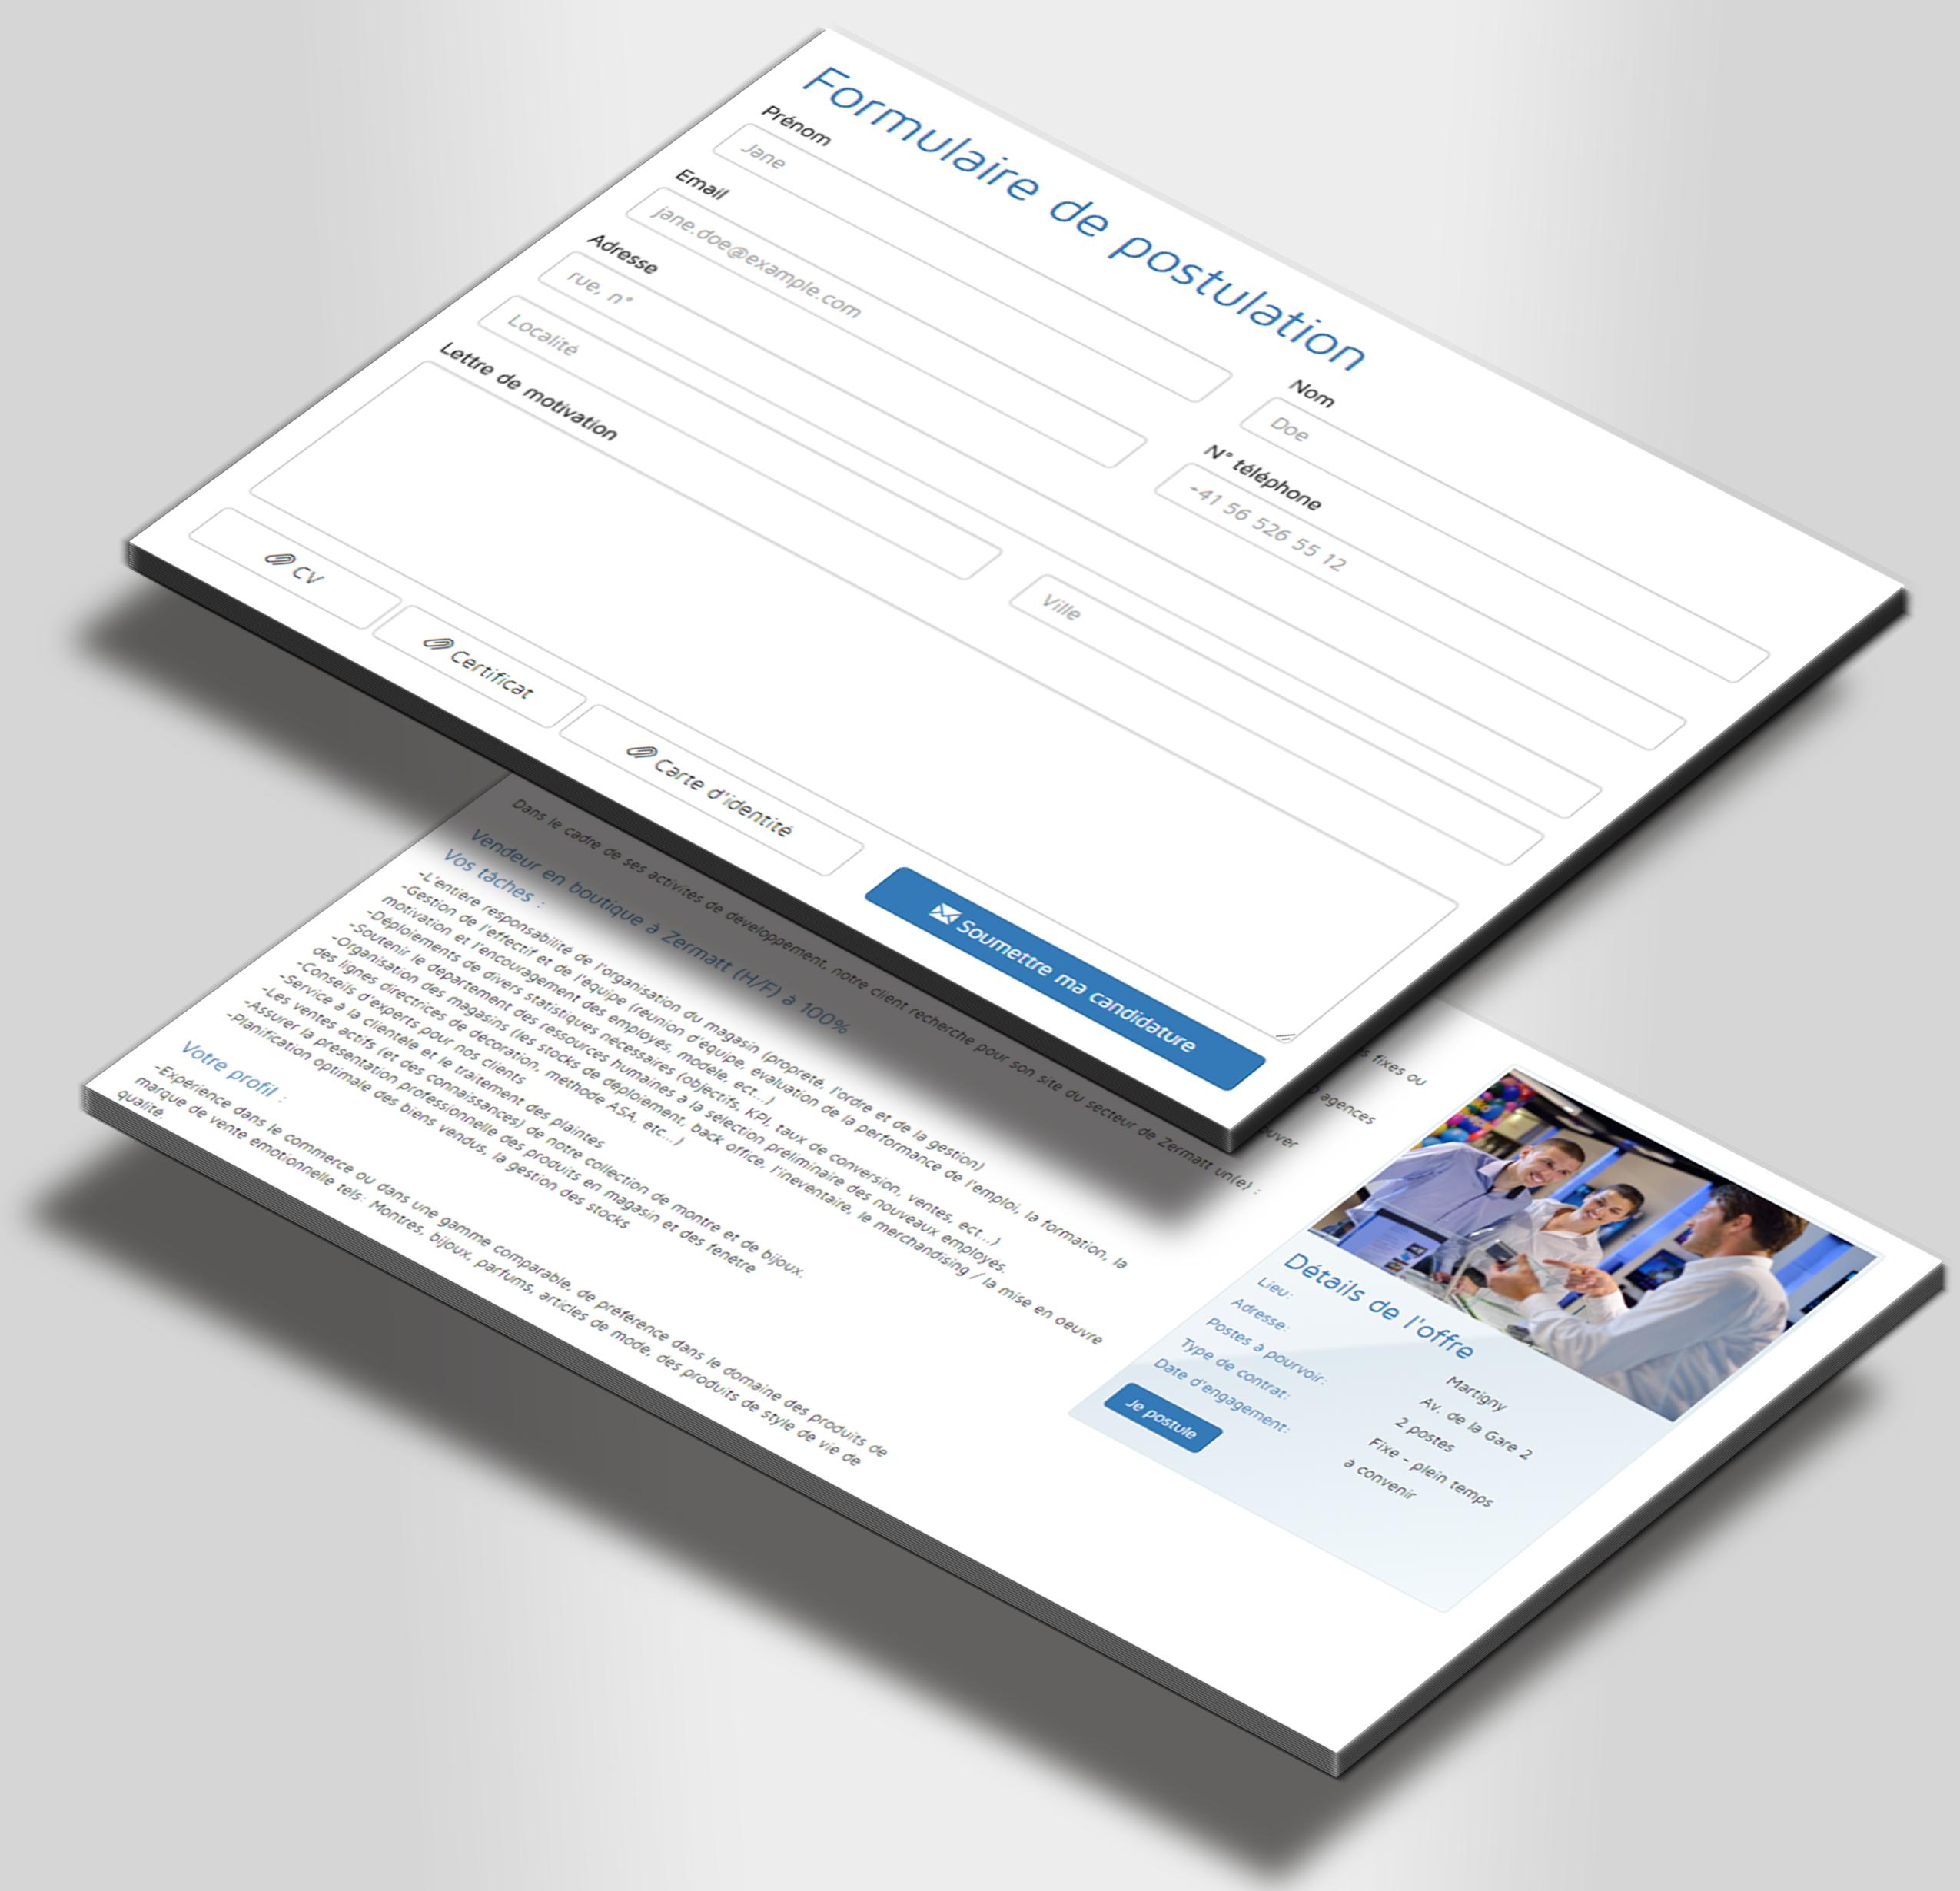 sai-erp-logiciel-informatique-rh-ressources-humaines-recrutement-planning-finance-budget-salaire